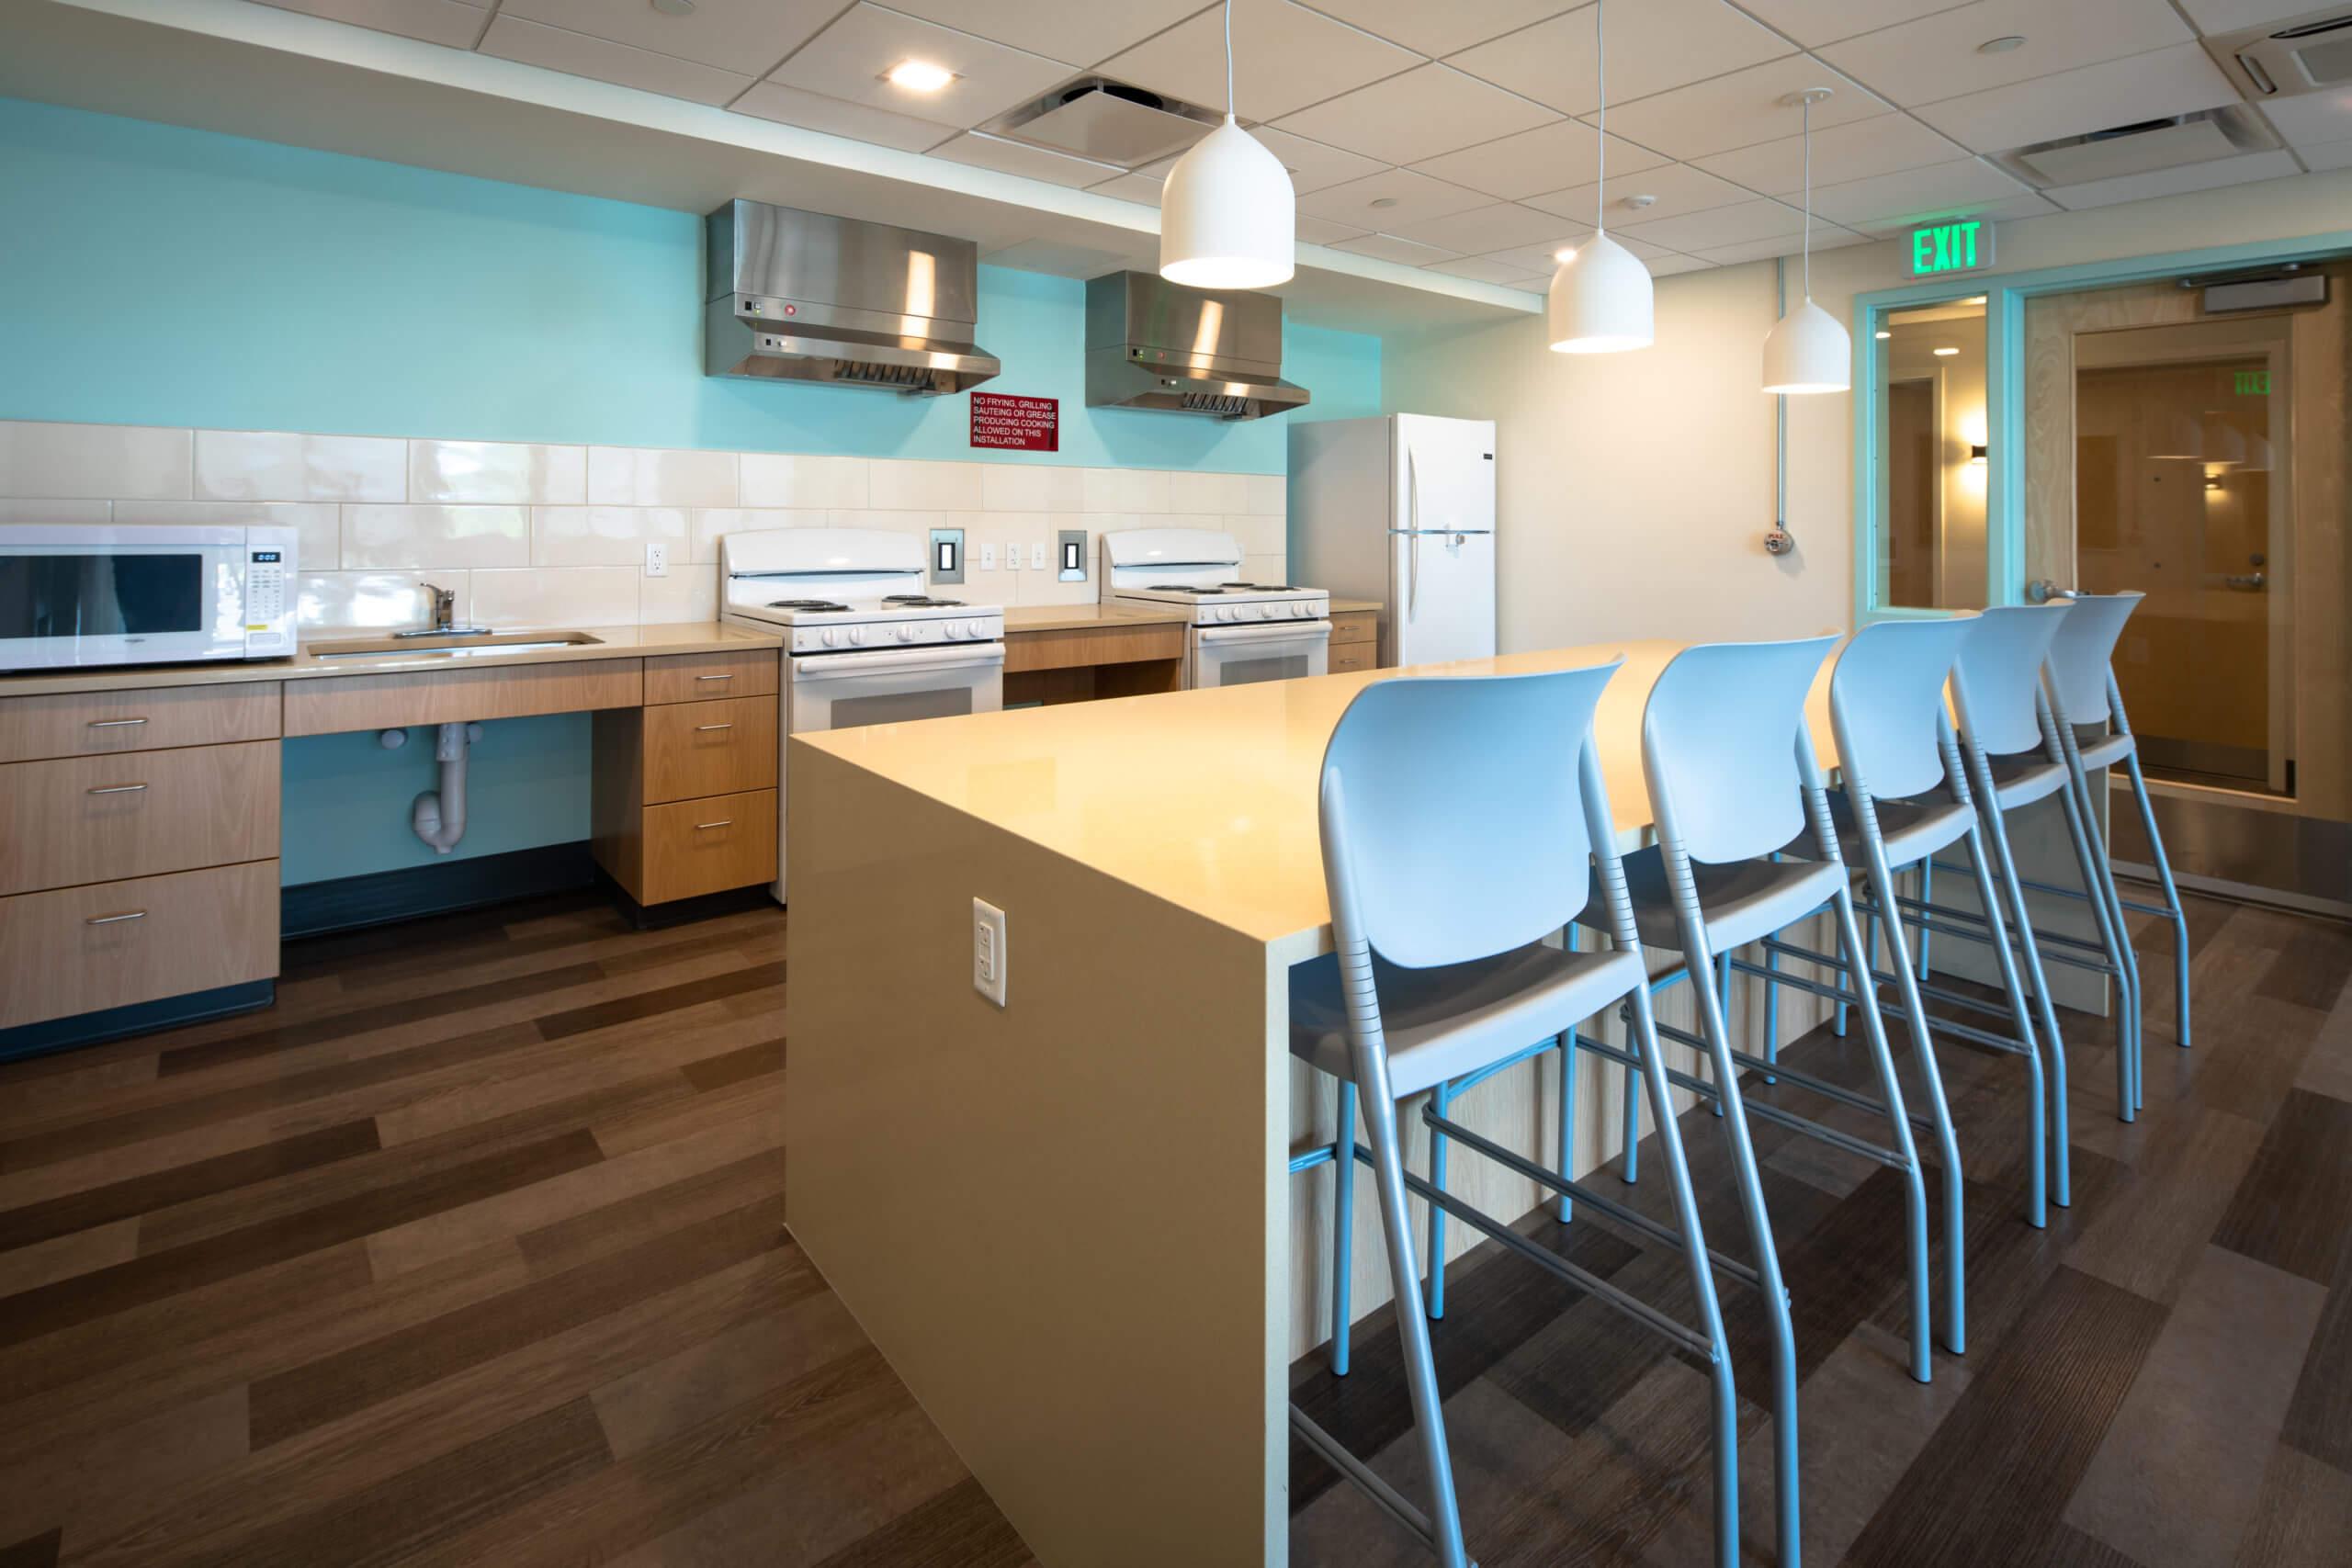 Empty community kitchen at blackburn center